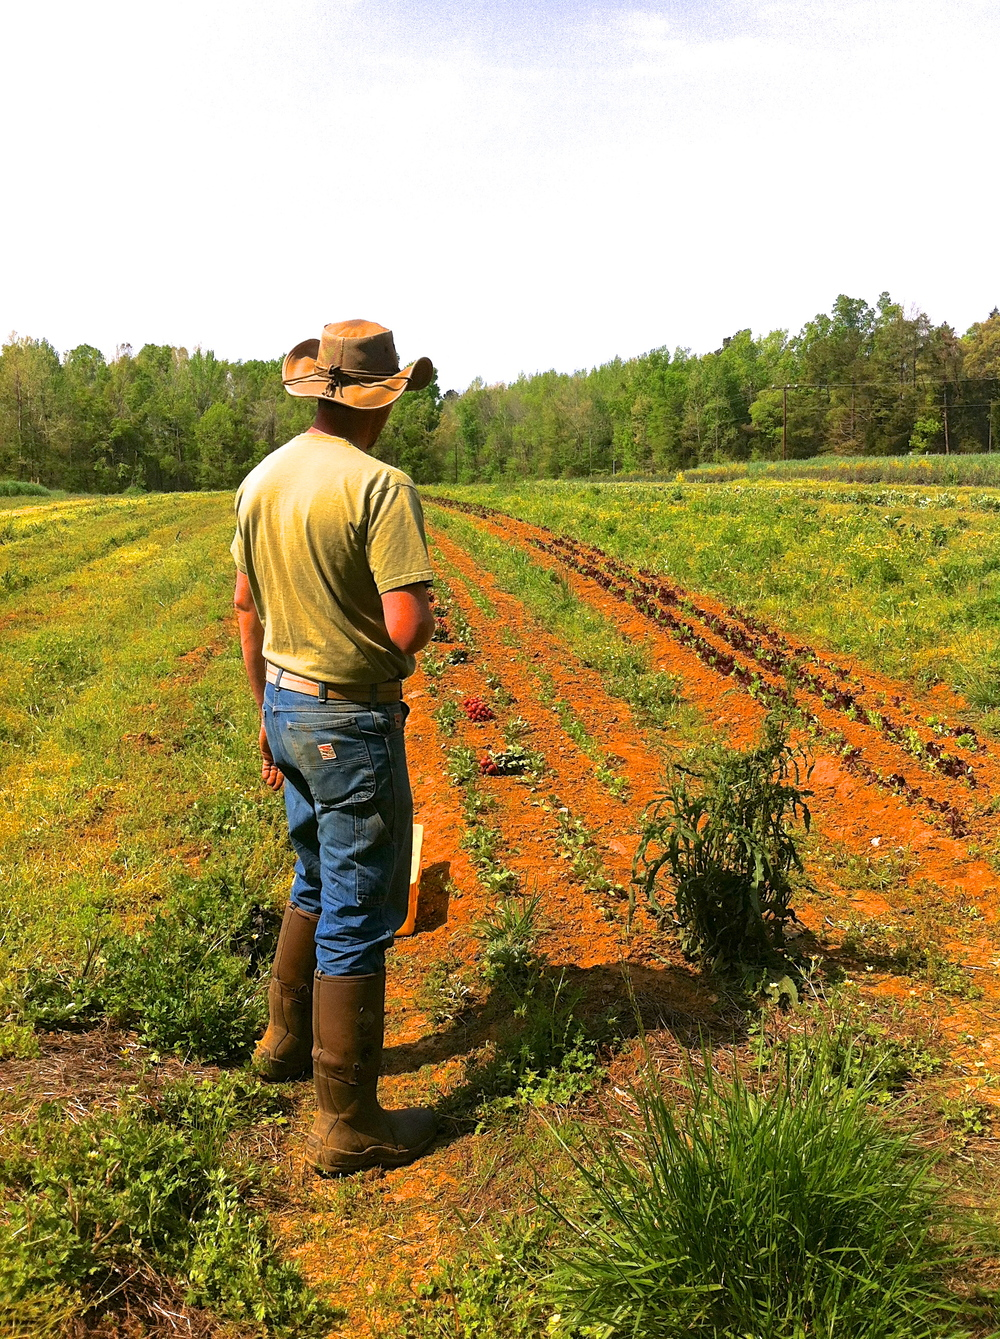 Chris Murray surveys the fields